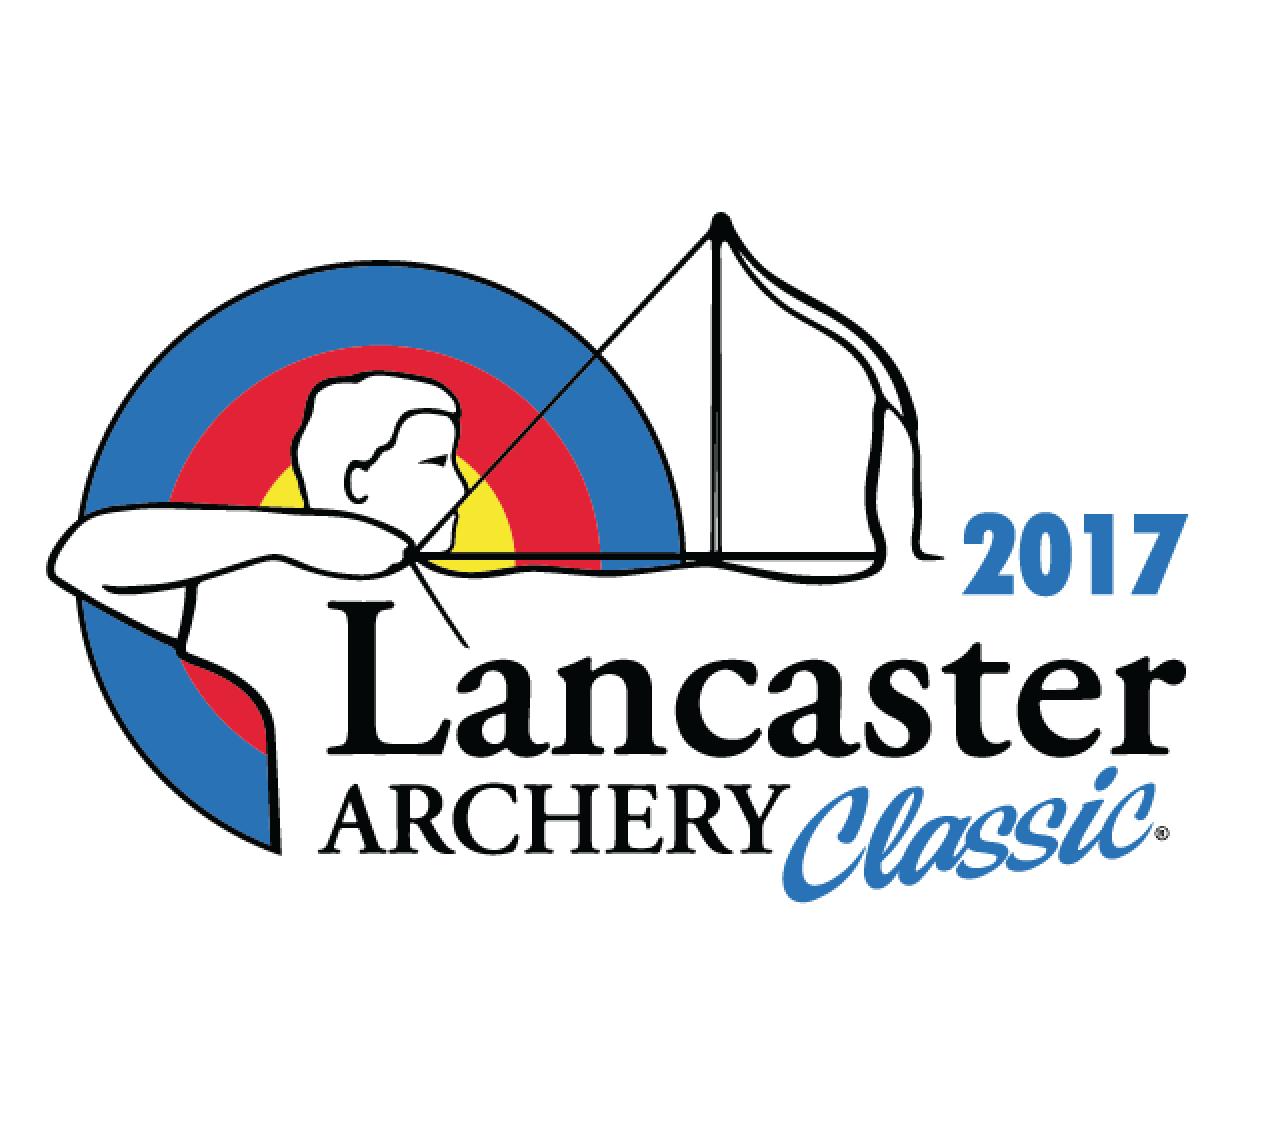 2017 Lancaster Archery Classic